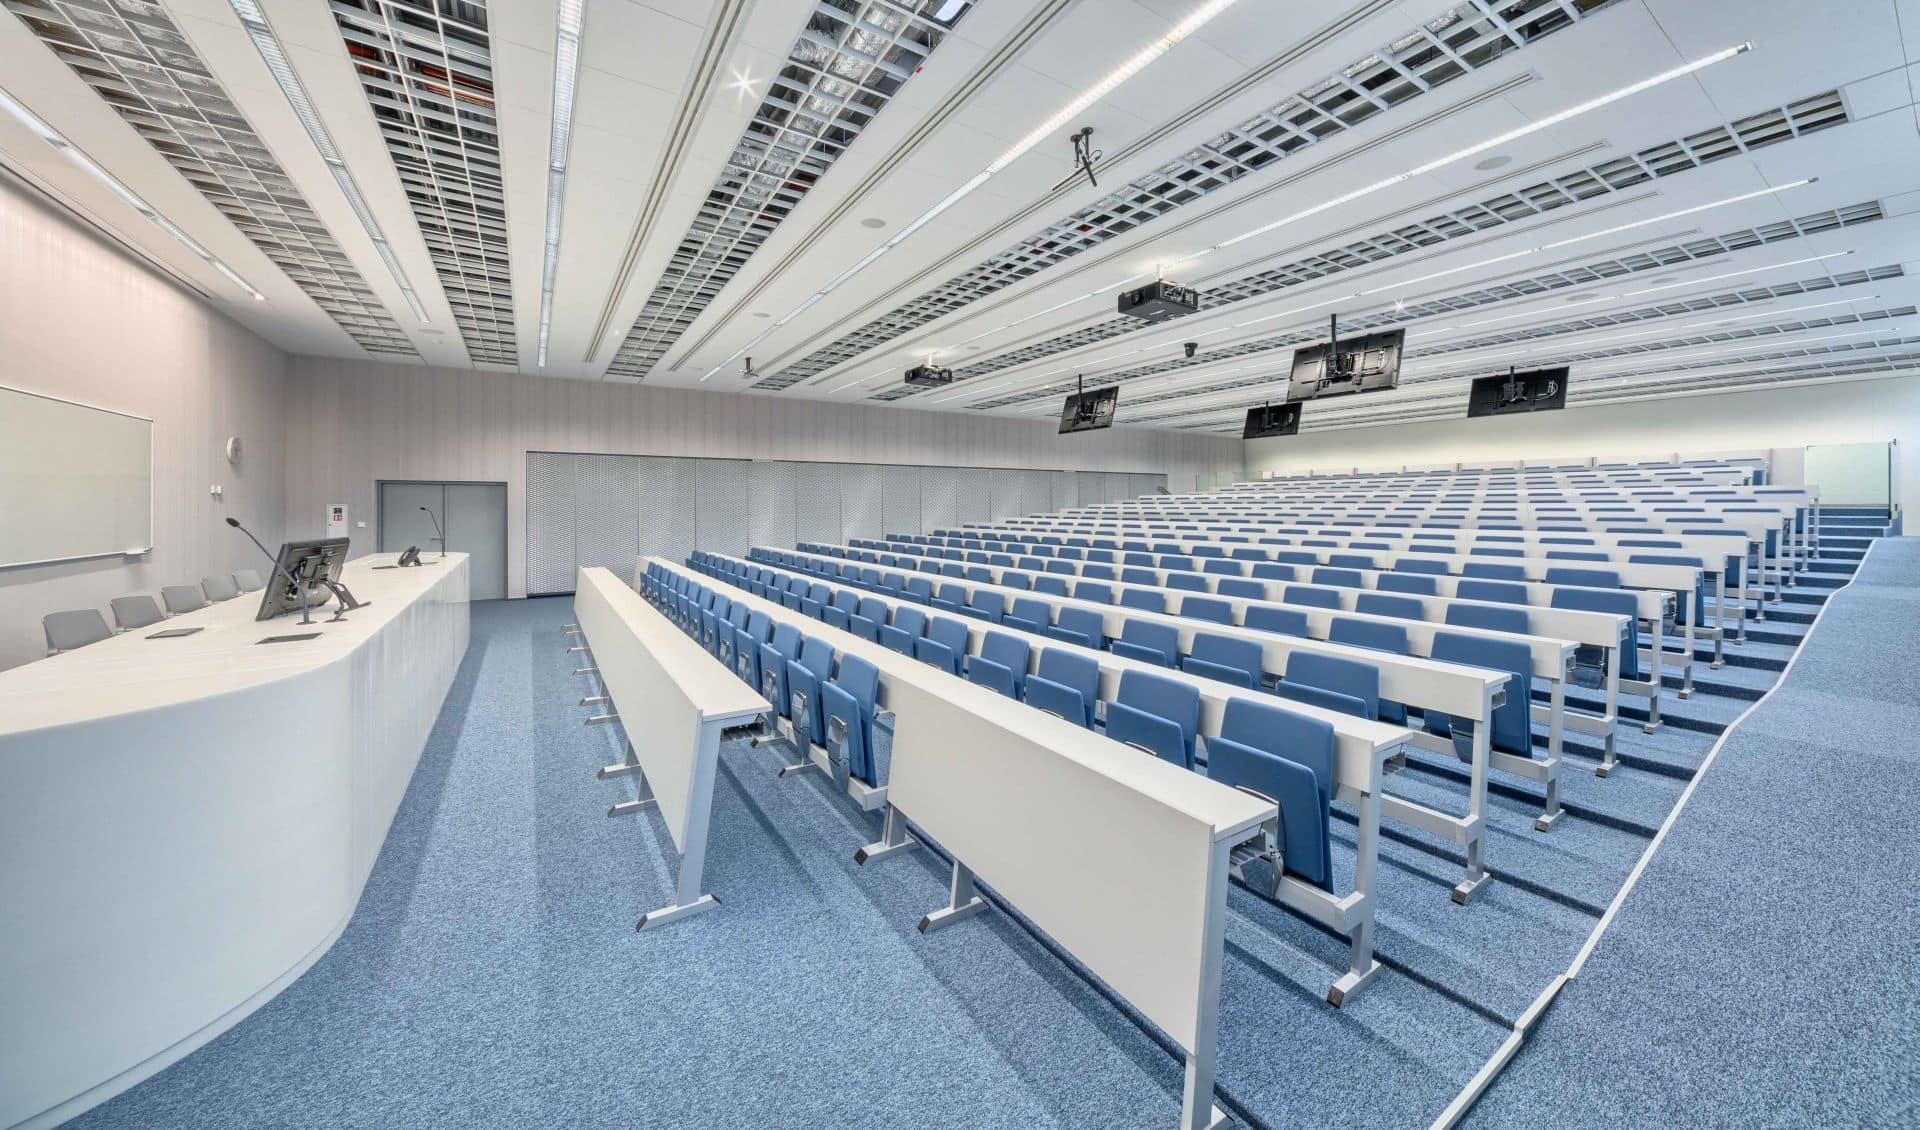 Ateneo 2.014, Università di Hradec Králové